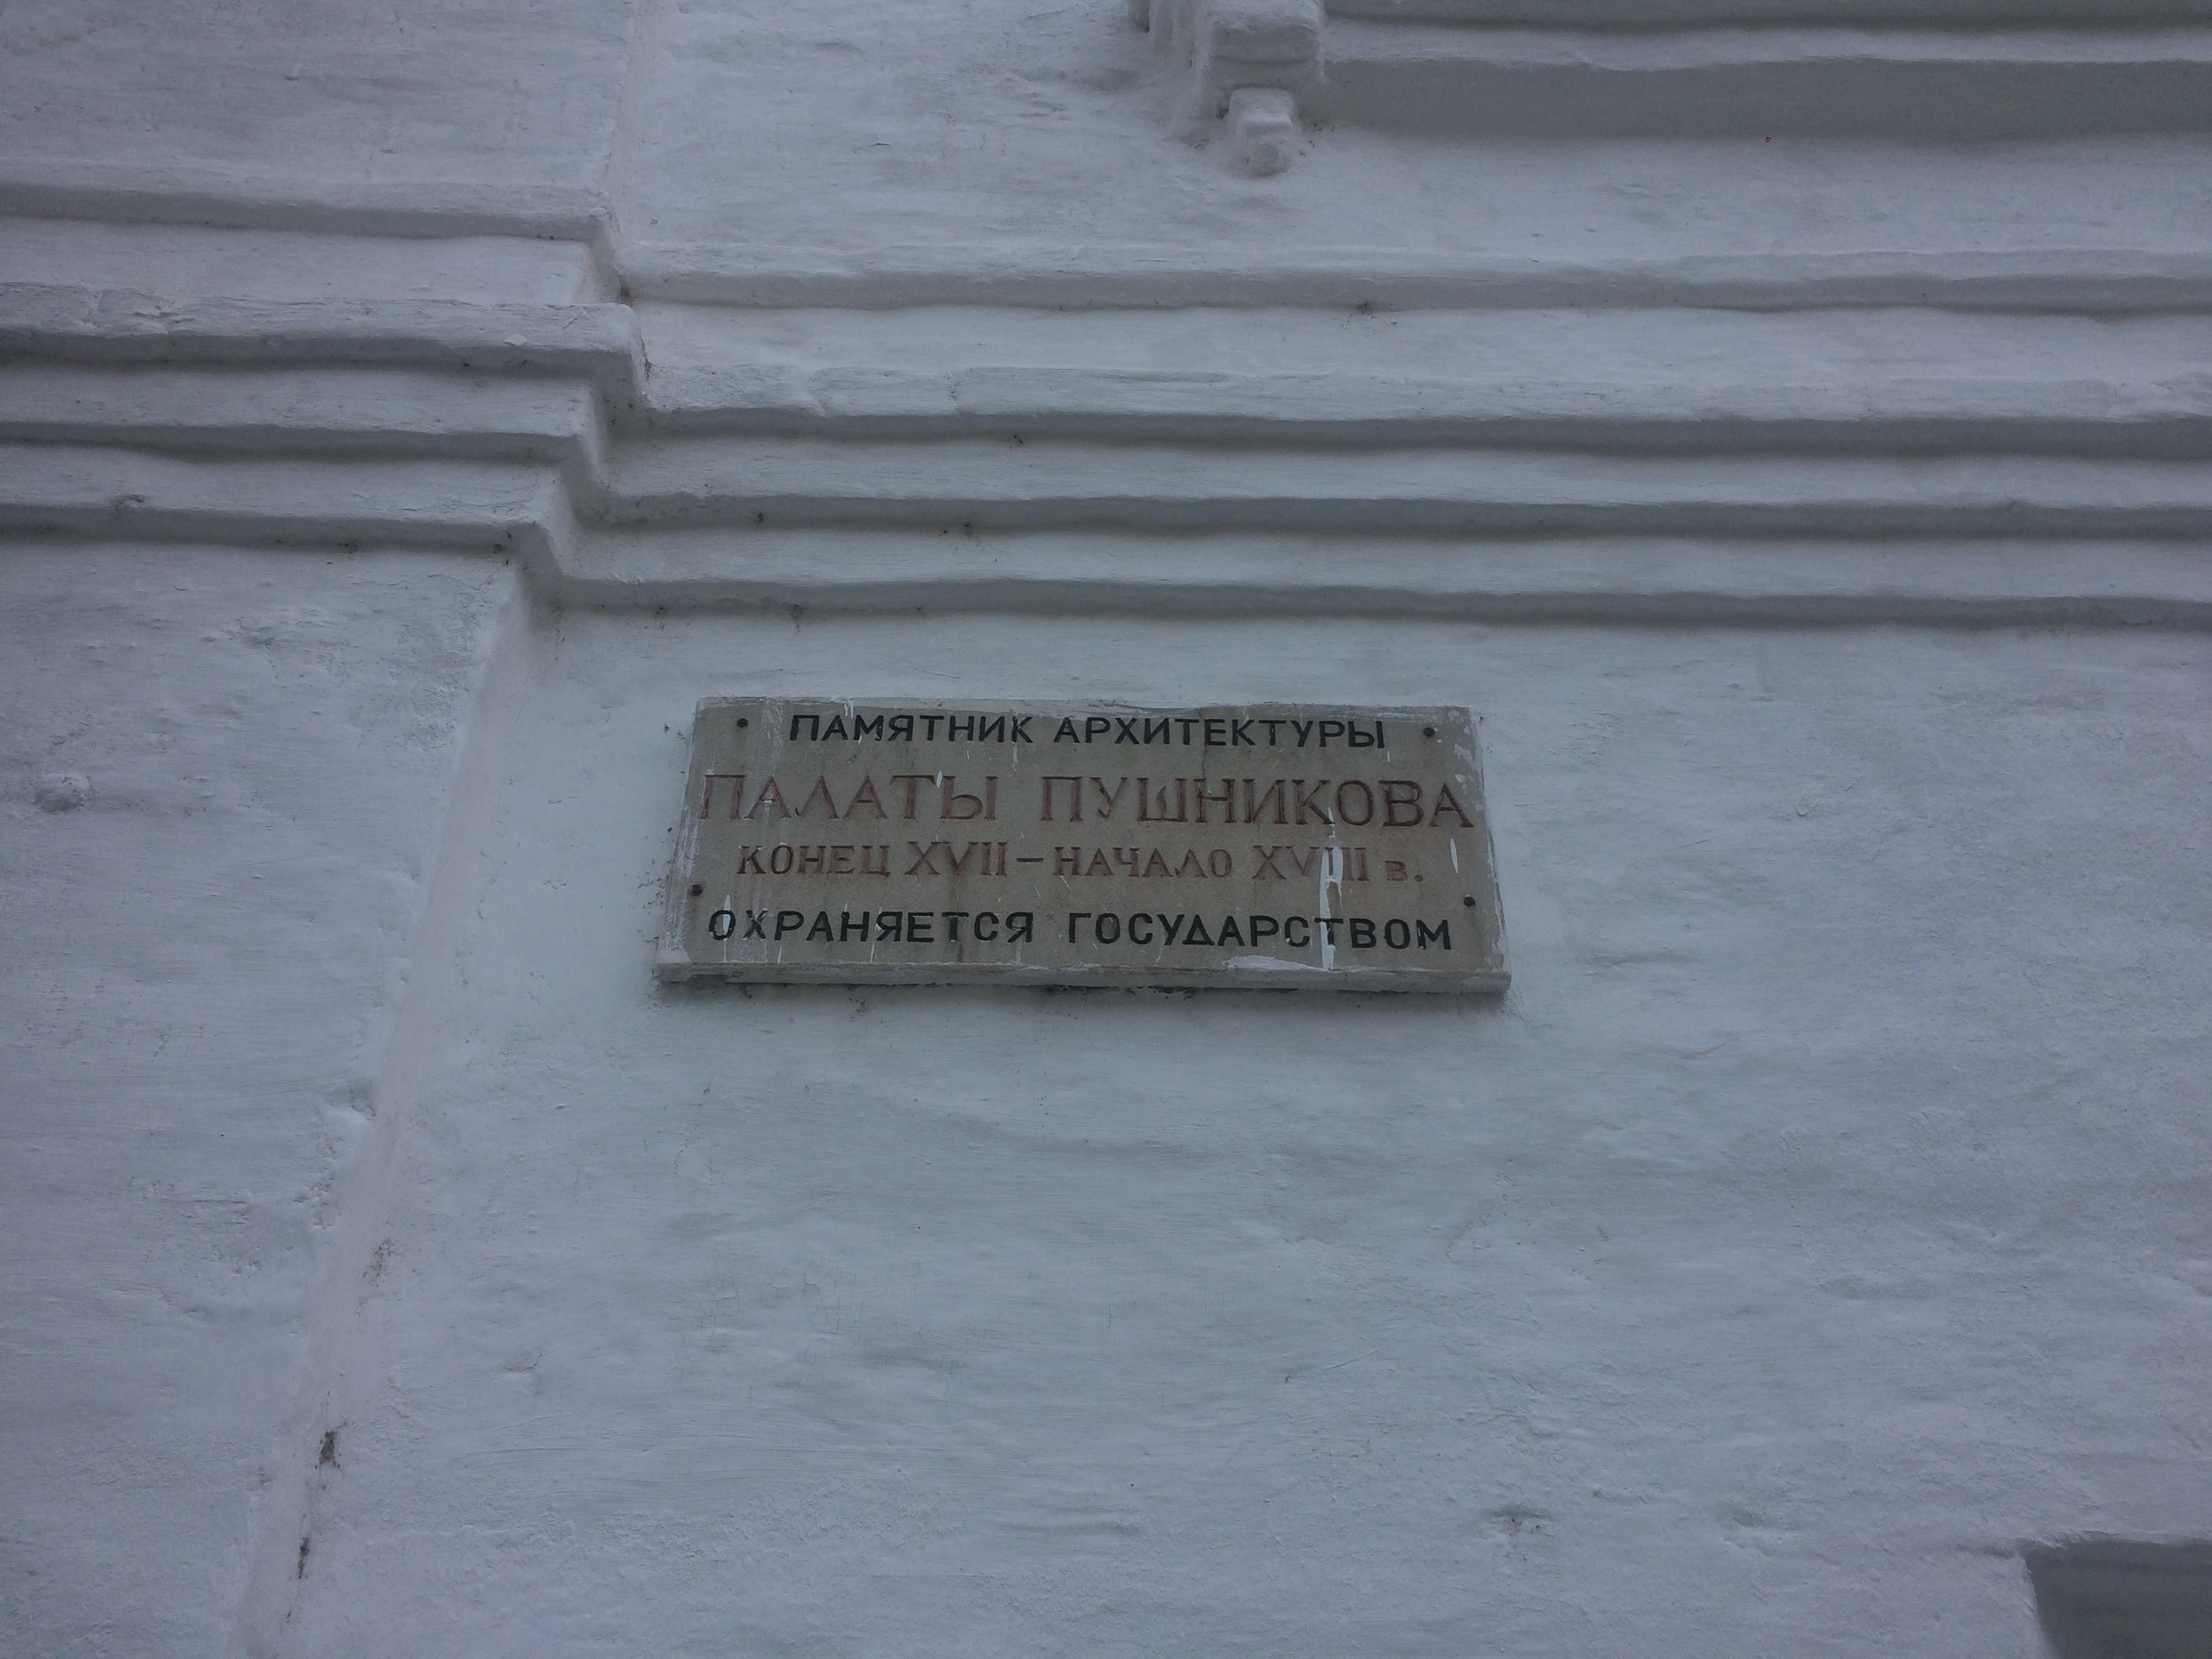 Палаты Пушникова